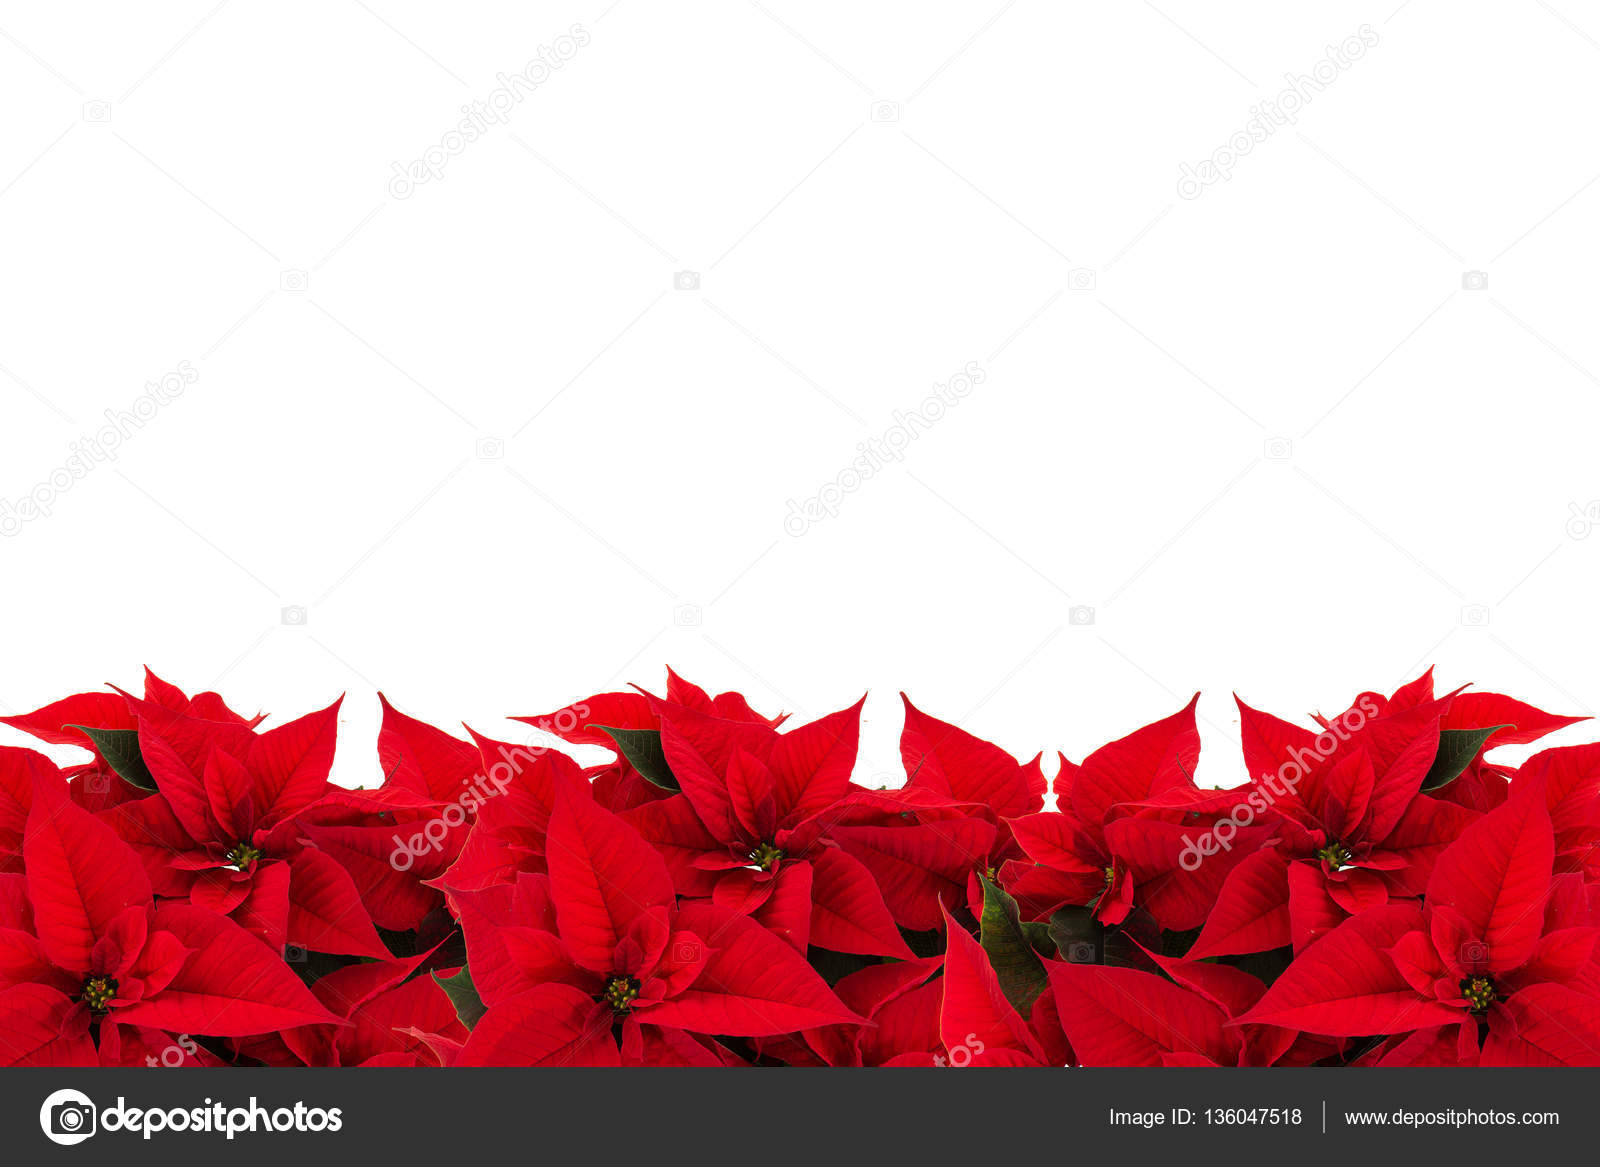 Rahmen Bilderrahmen Rot Weihnachten Blumen — Stockfoto ...